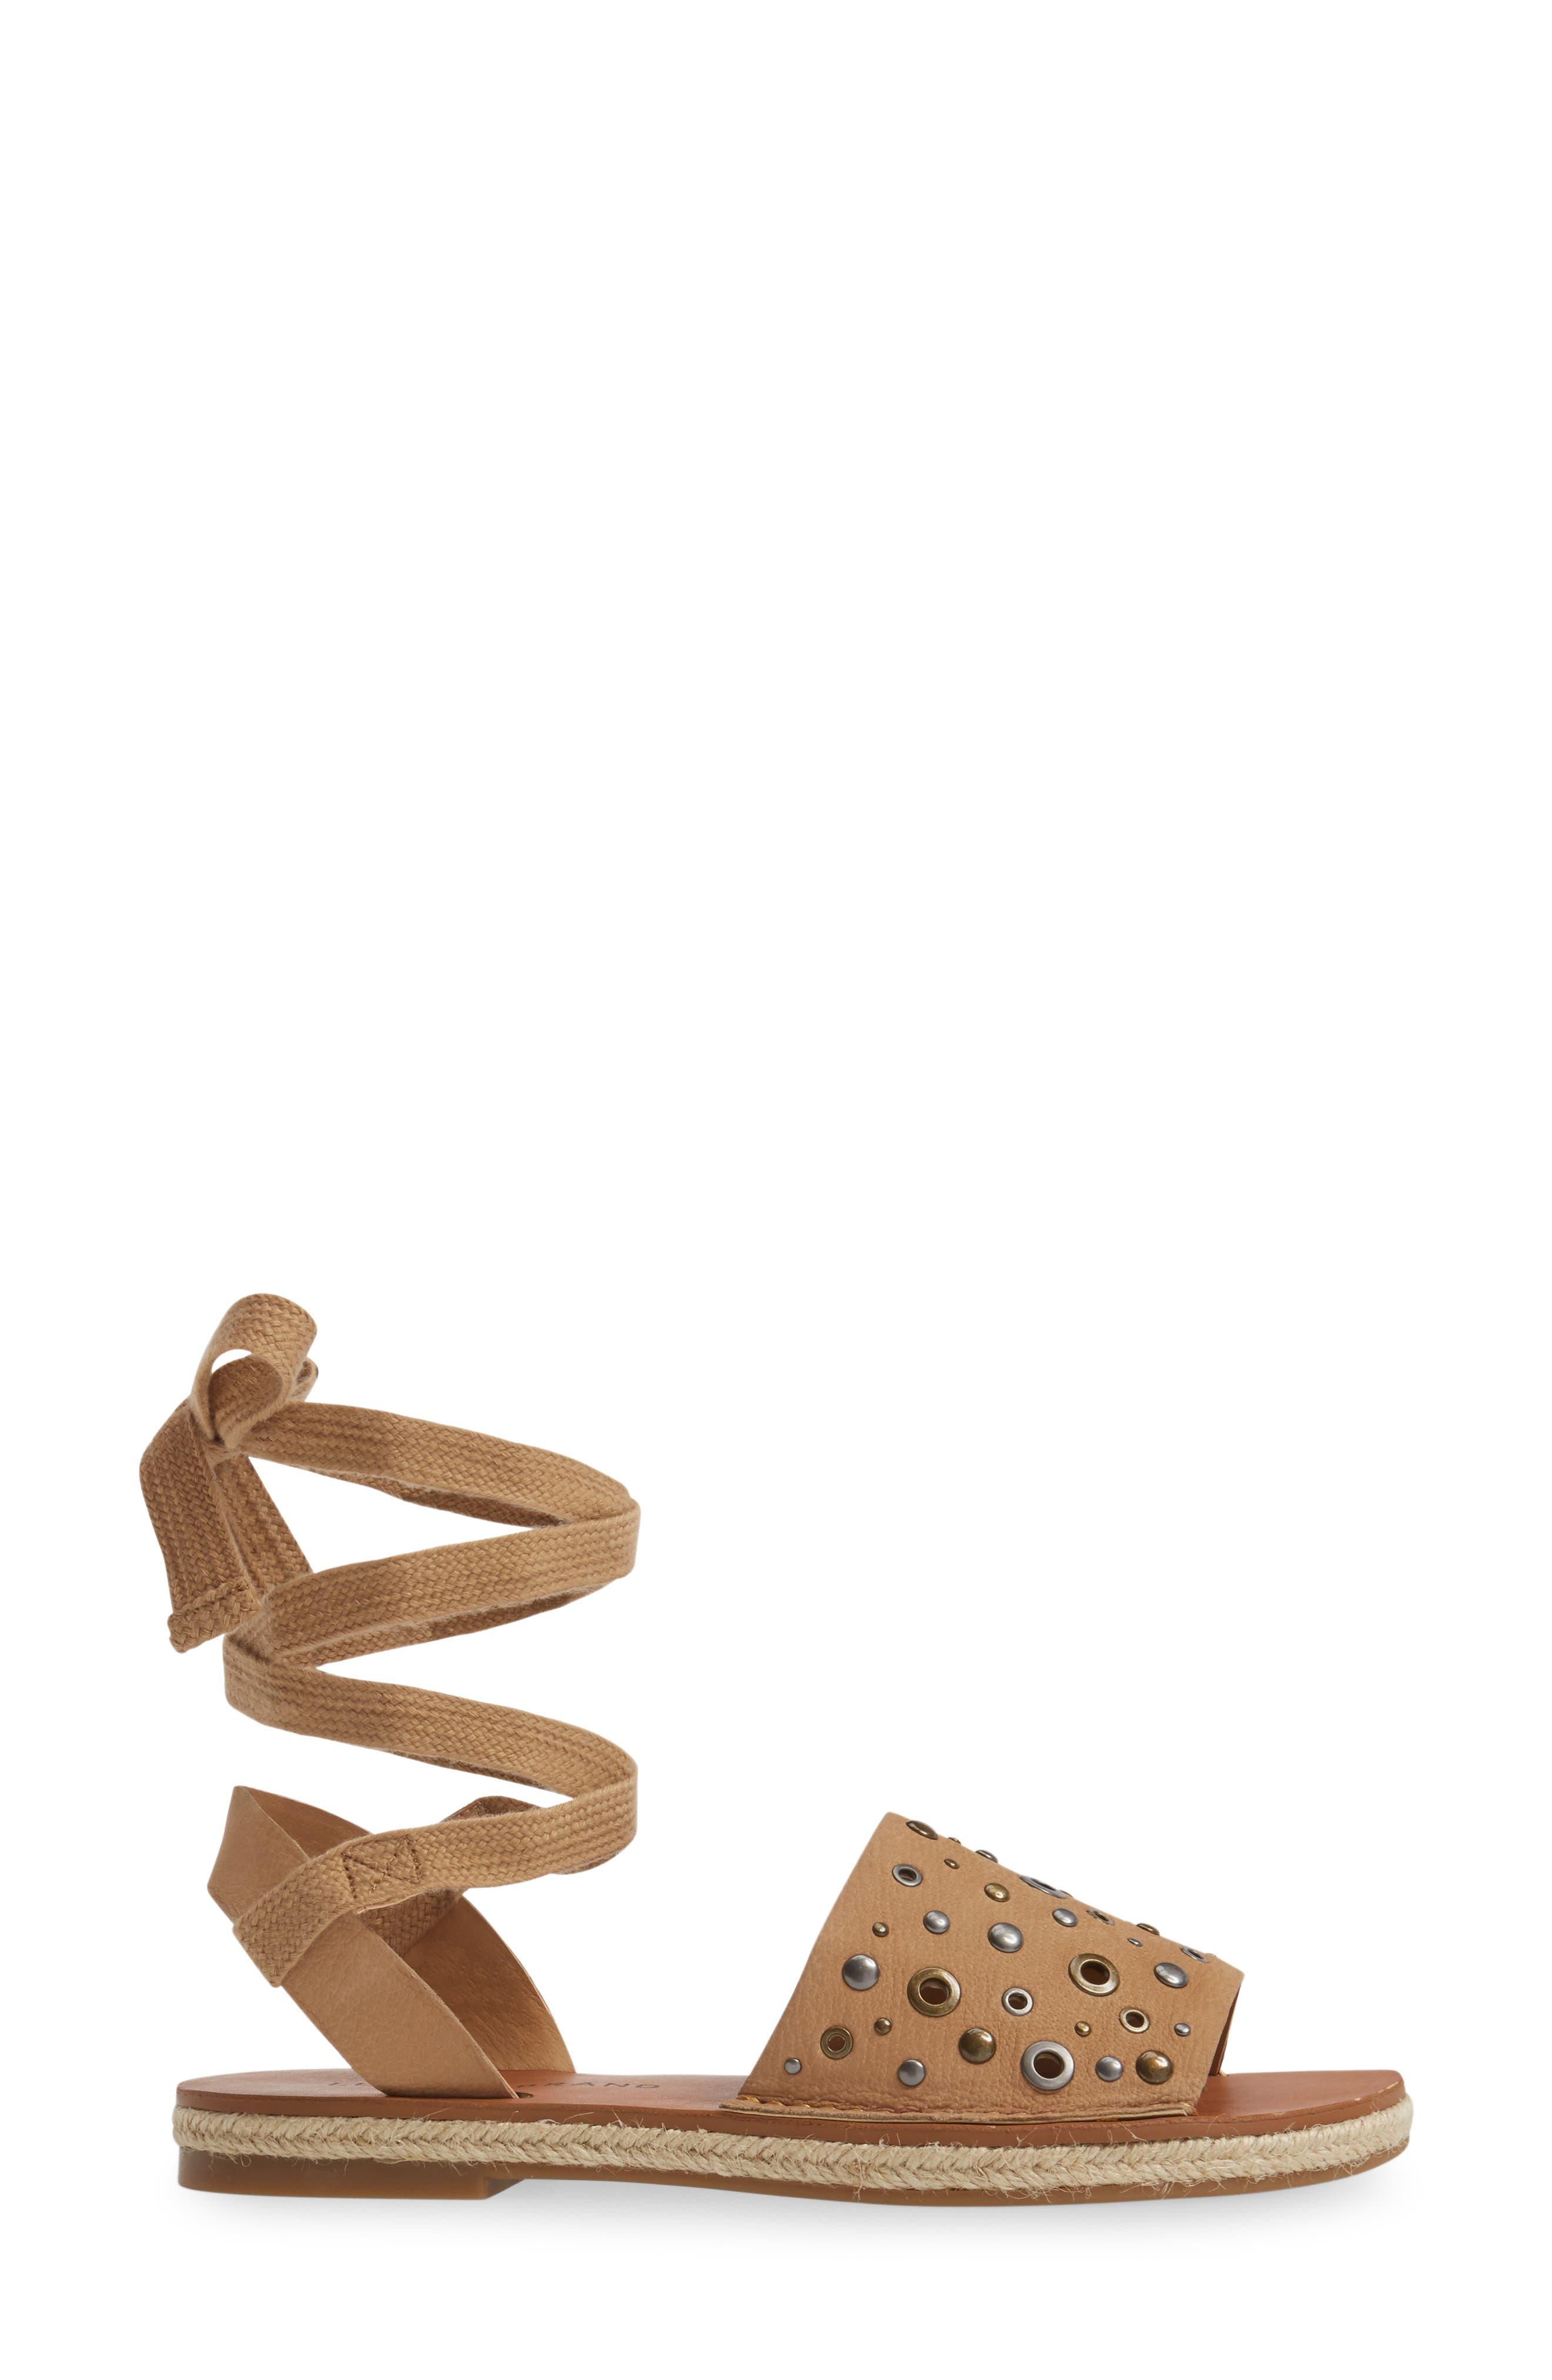 Daytah Ankle Tie Sandal,                             Alternate thumbnail 11, color,